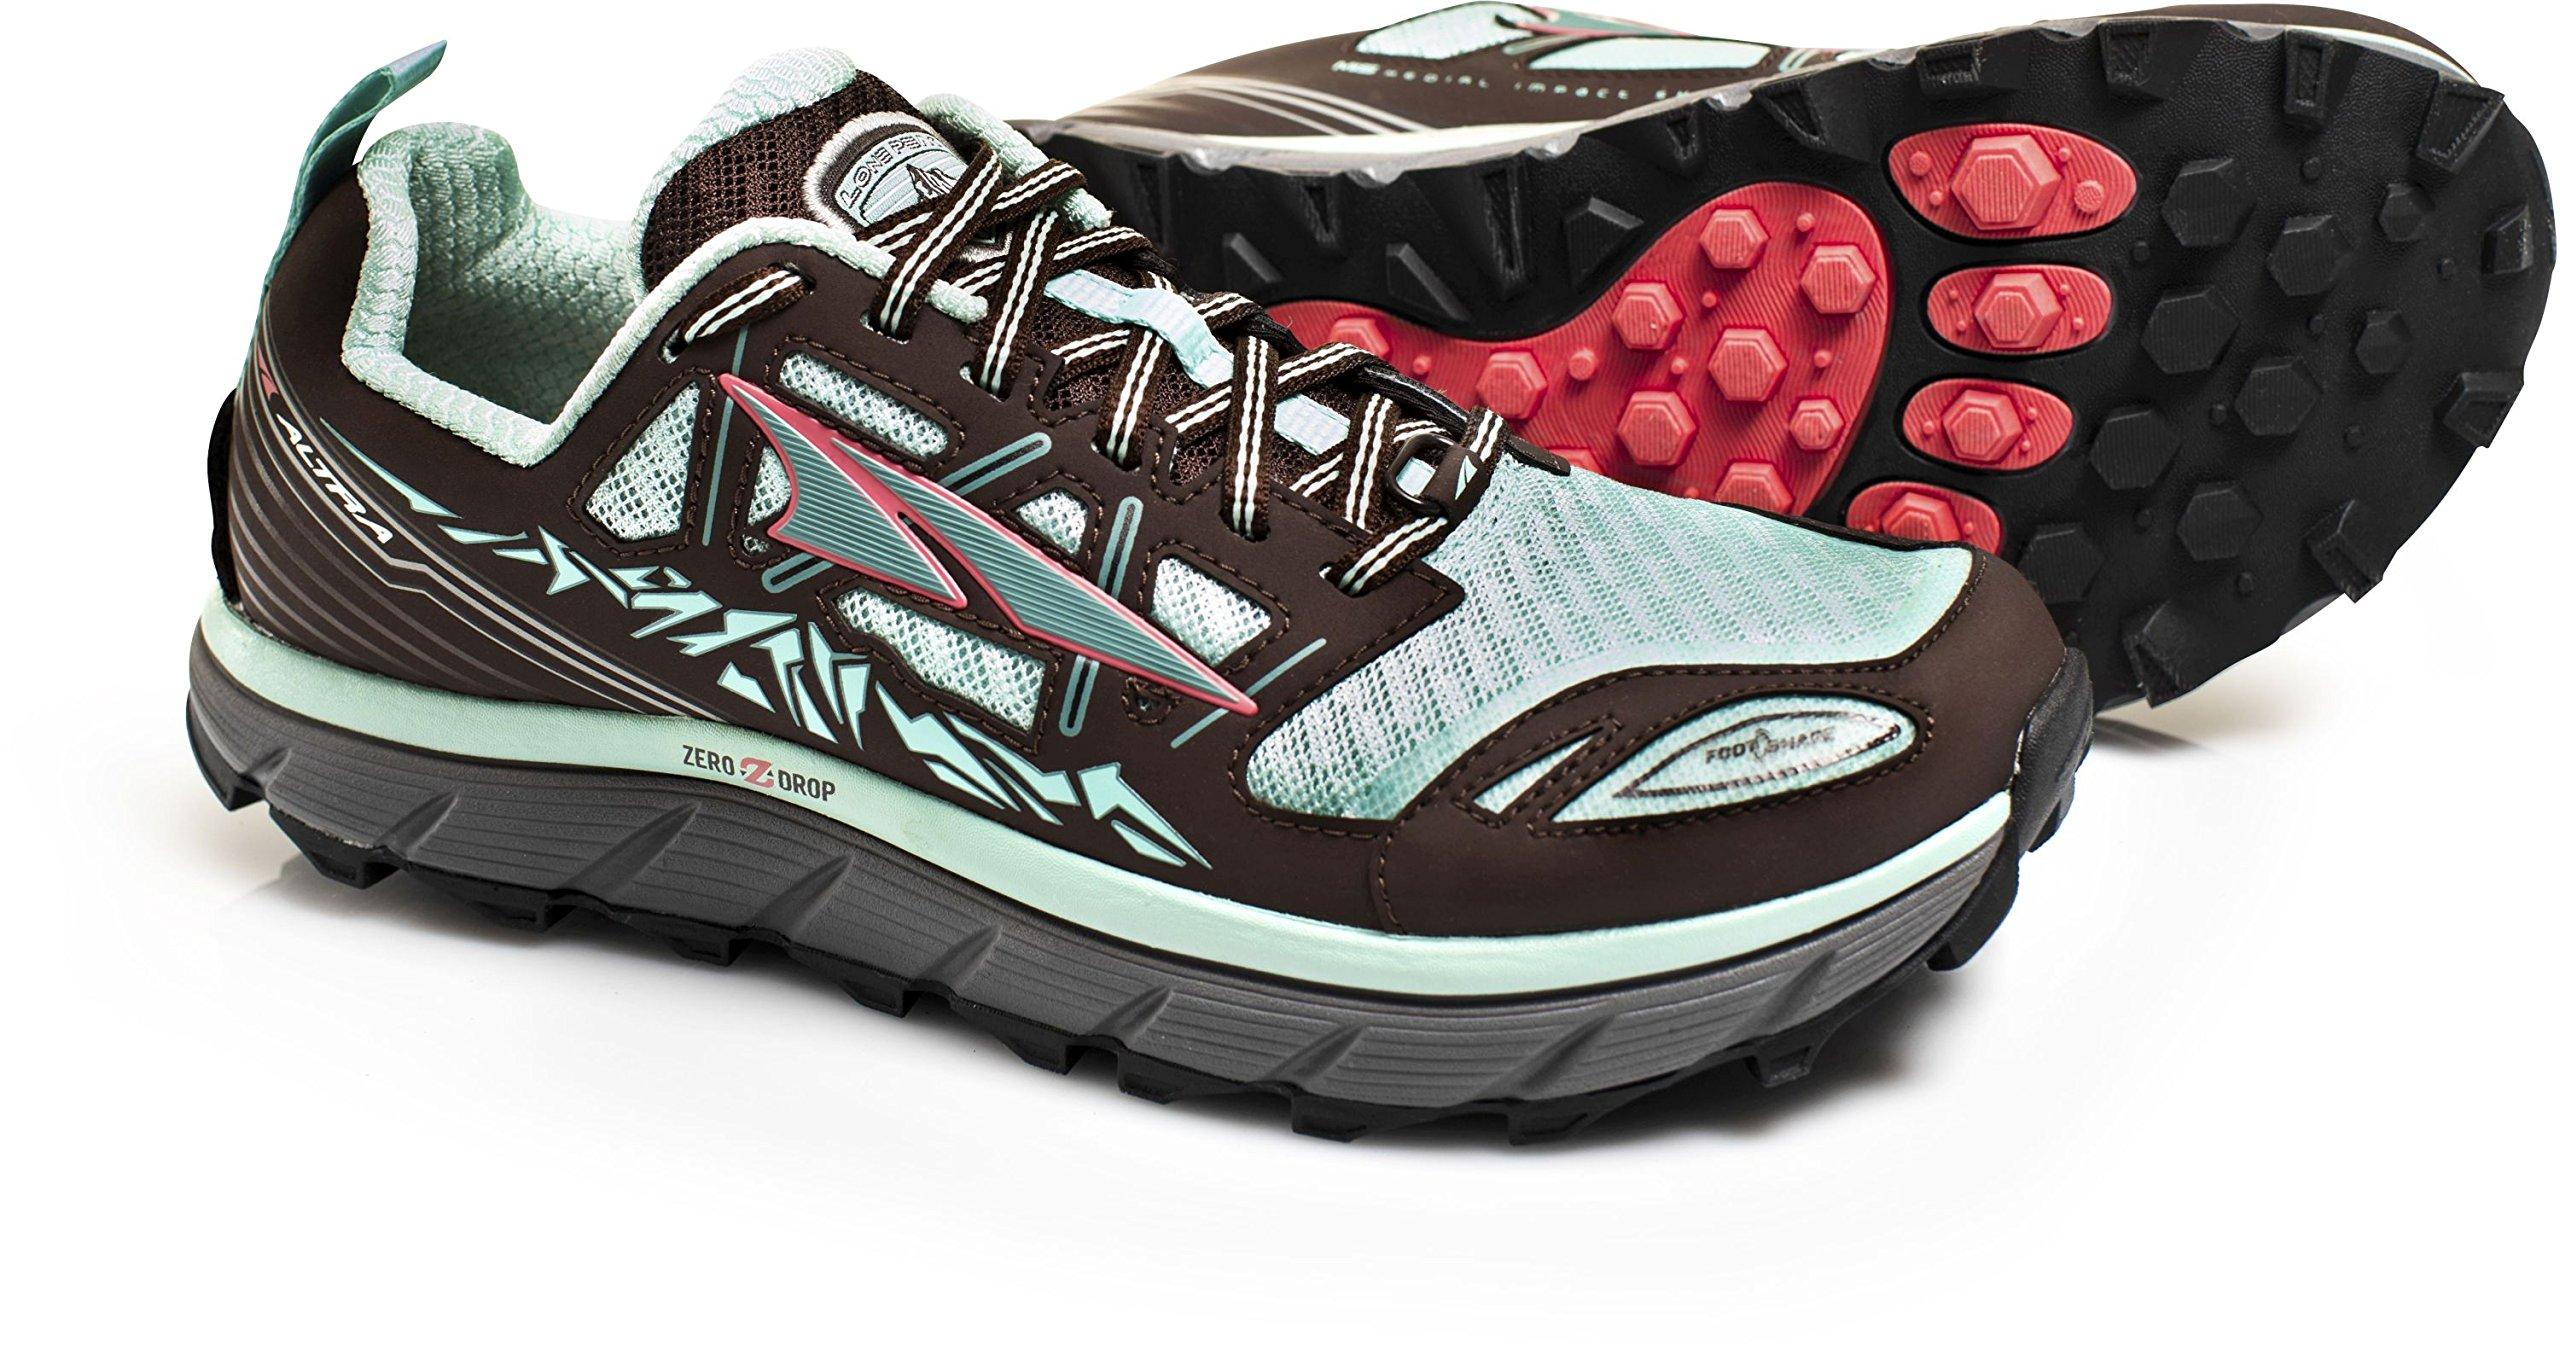 Altra Women's Lone Peak 3 Trail Runner, Blue, 9 M US